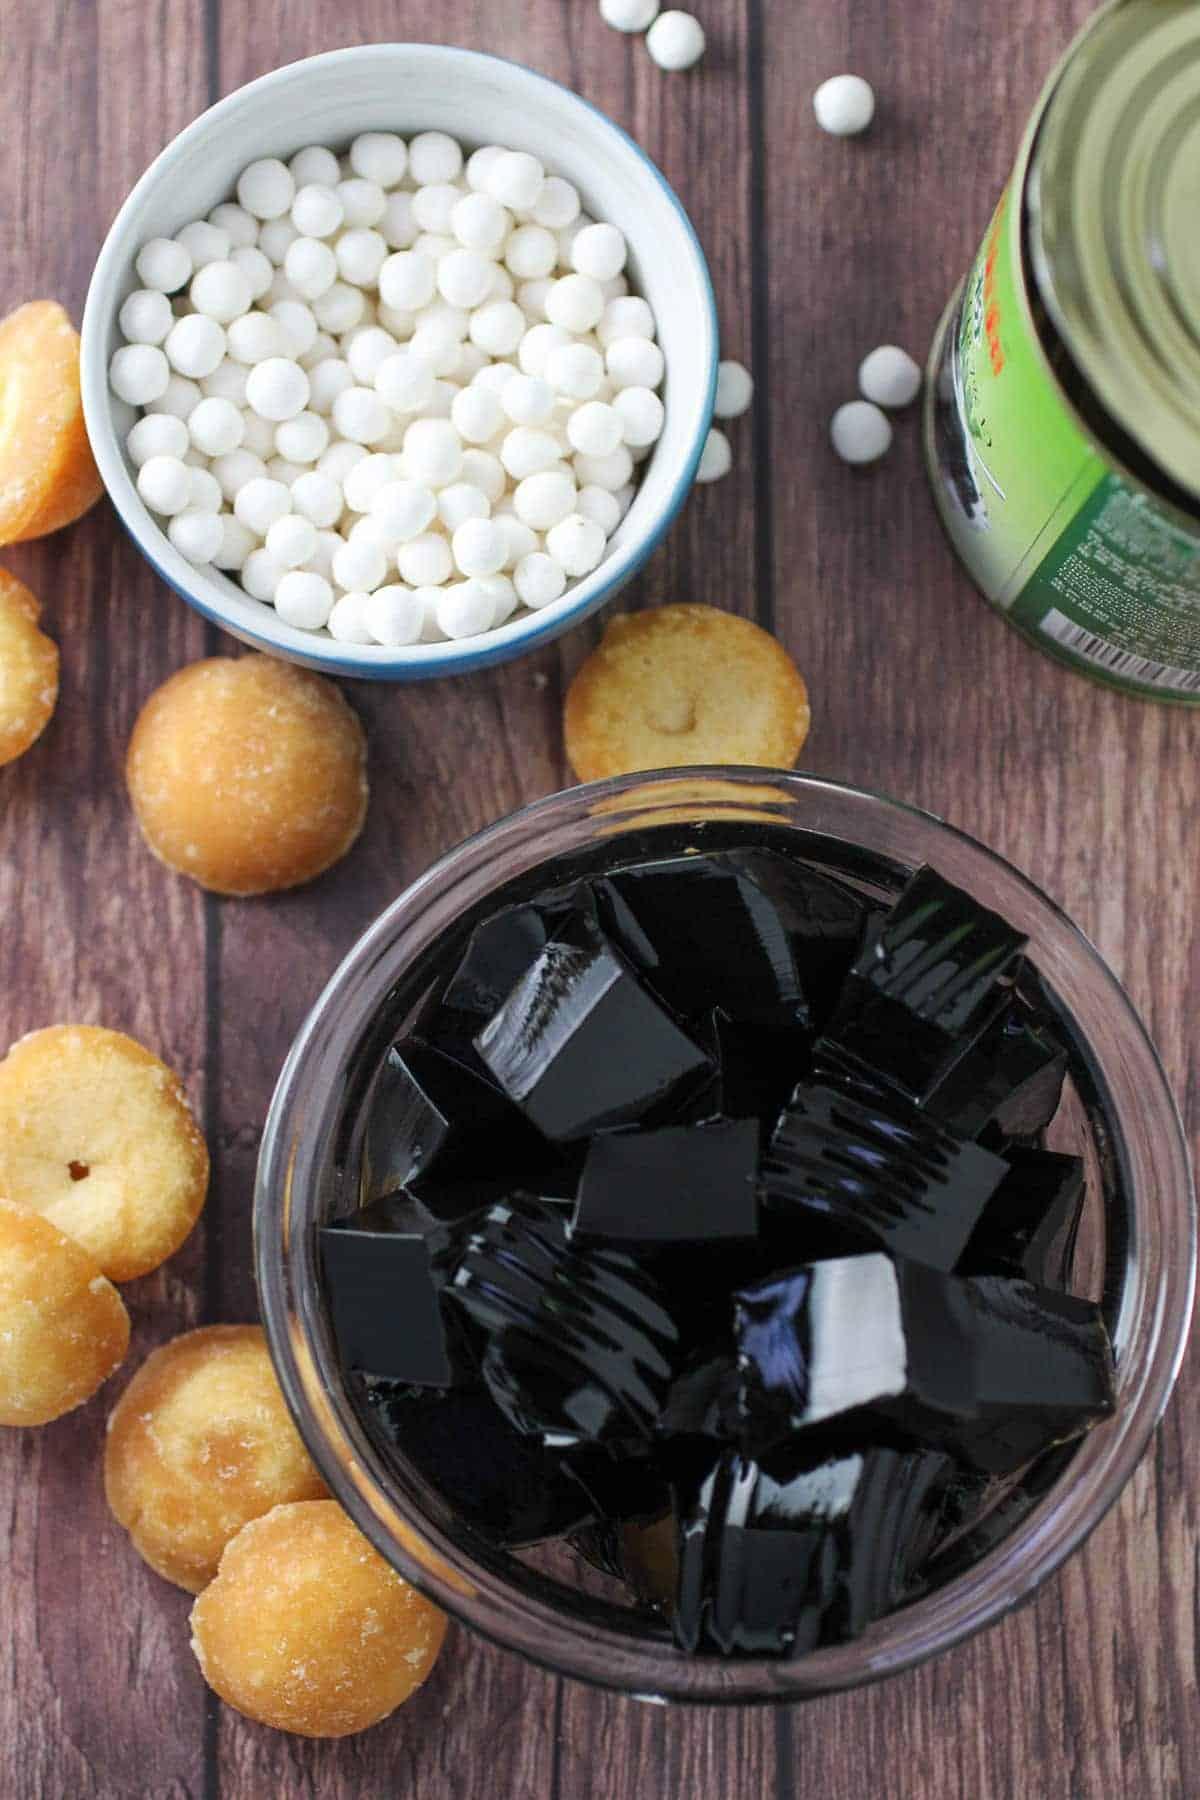 uncooked sago, black jelly cubes, panutsa